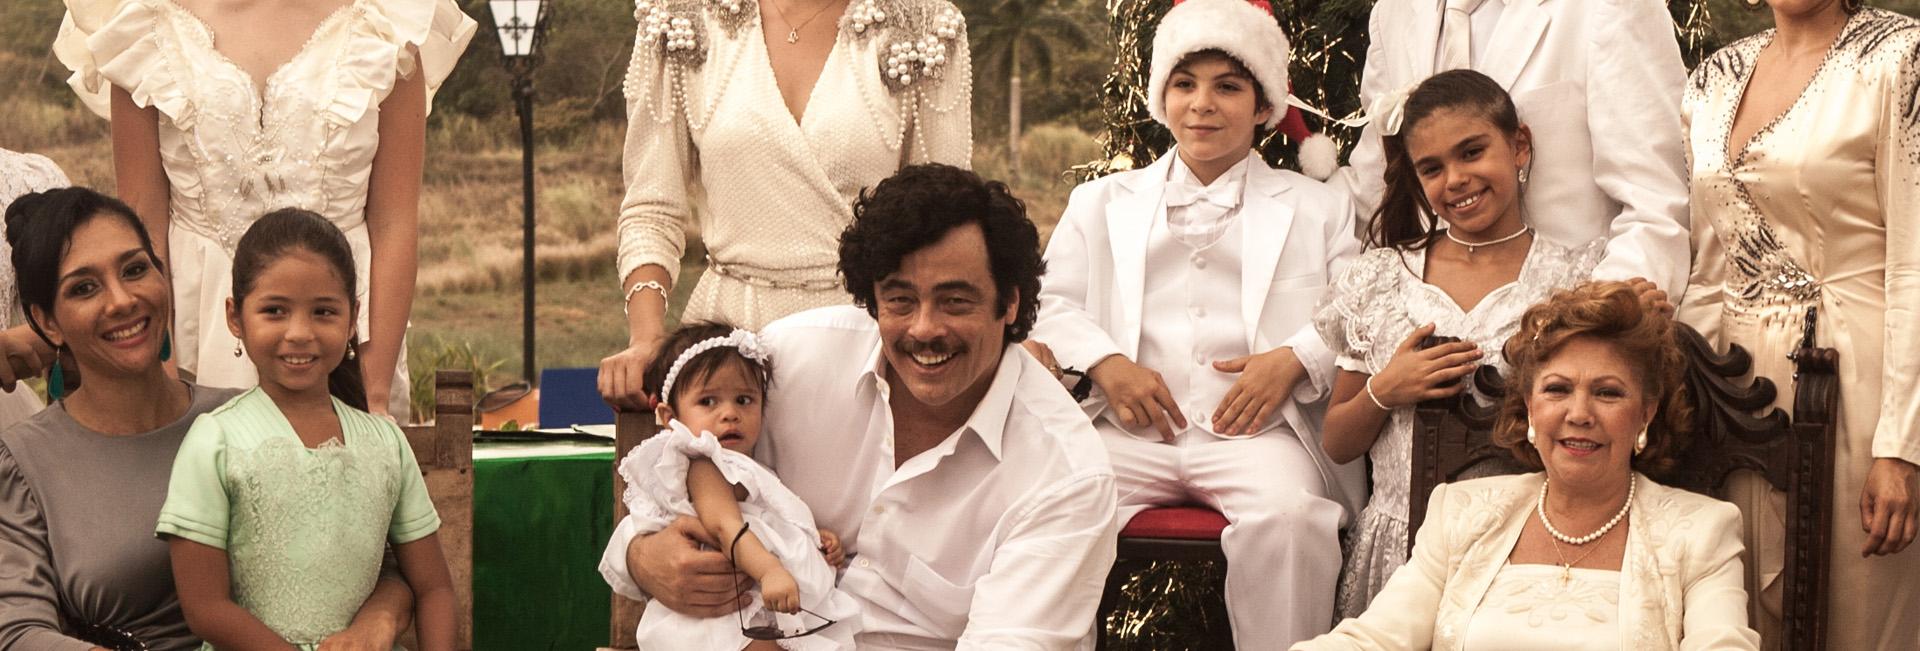 Escobar Paradise Lost - 18.jpg